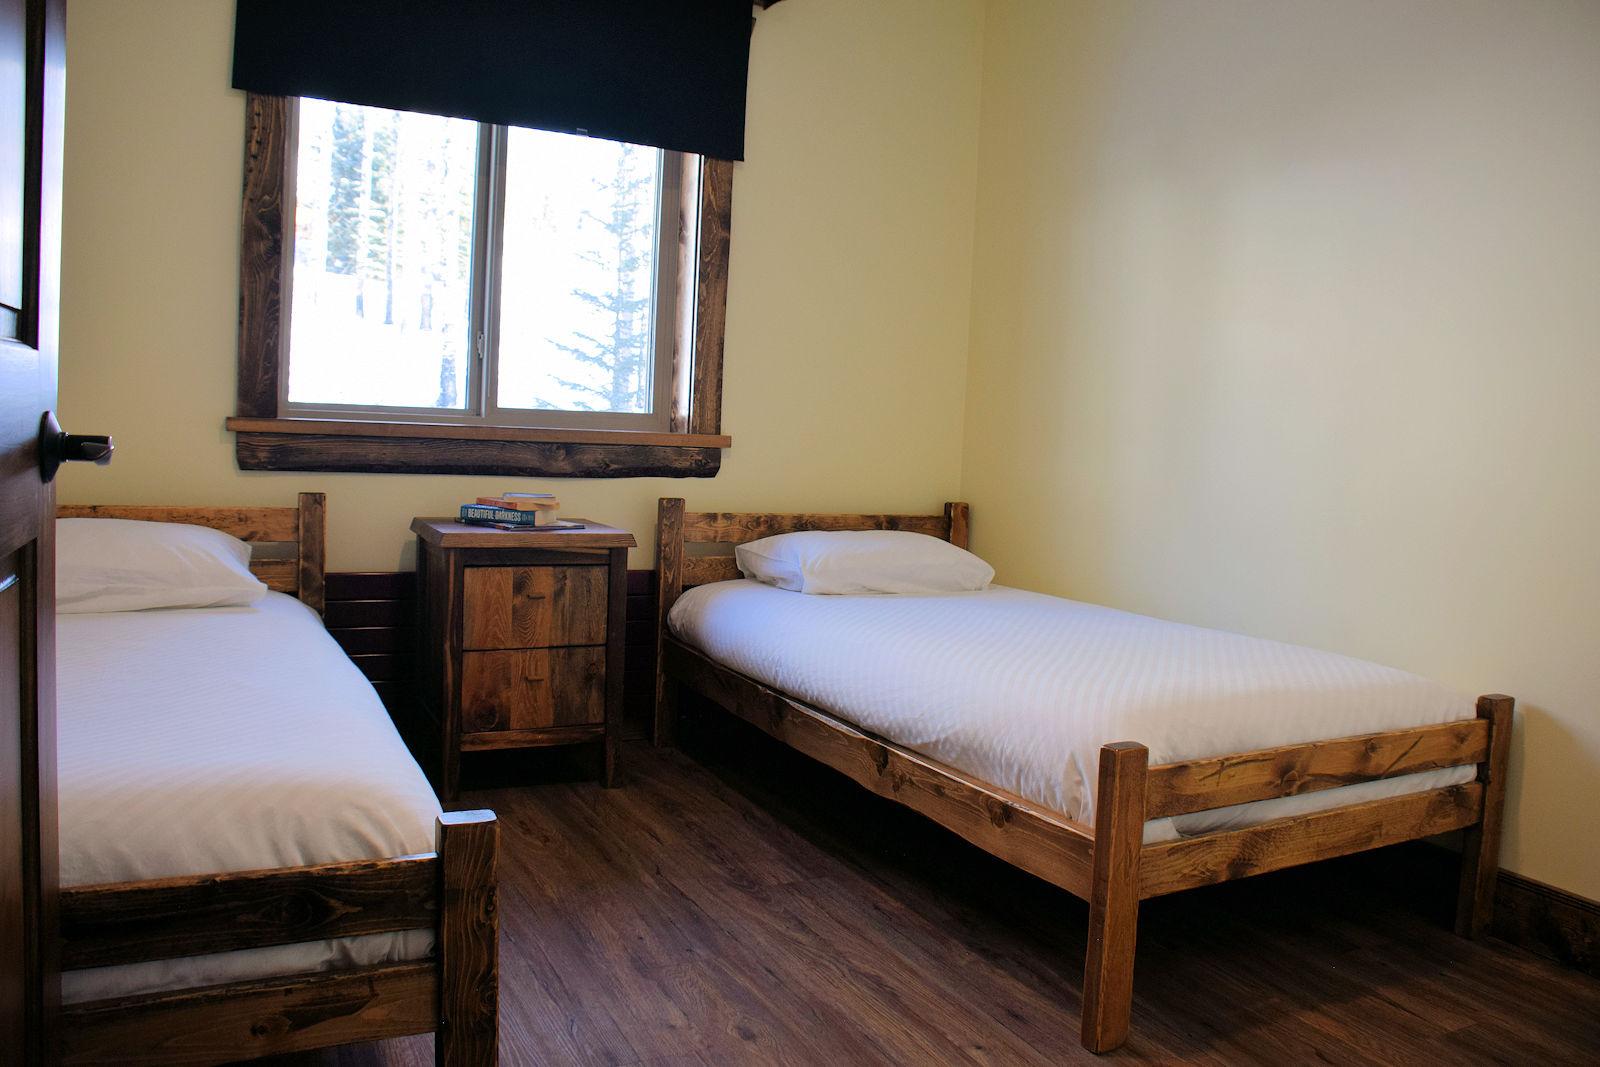 https://0901.nccdn.net/4_2/000/000/00d/f43/twin-bedroom-1600x1067.jpg